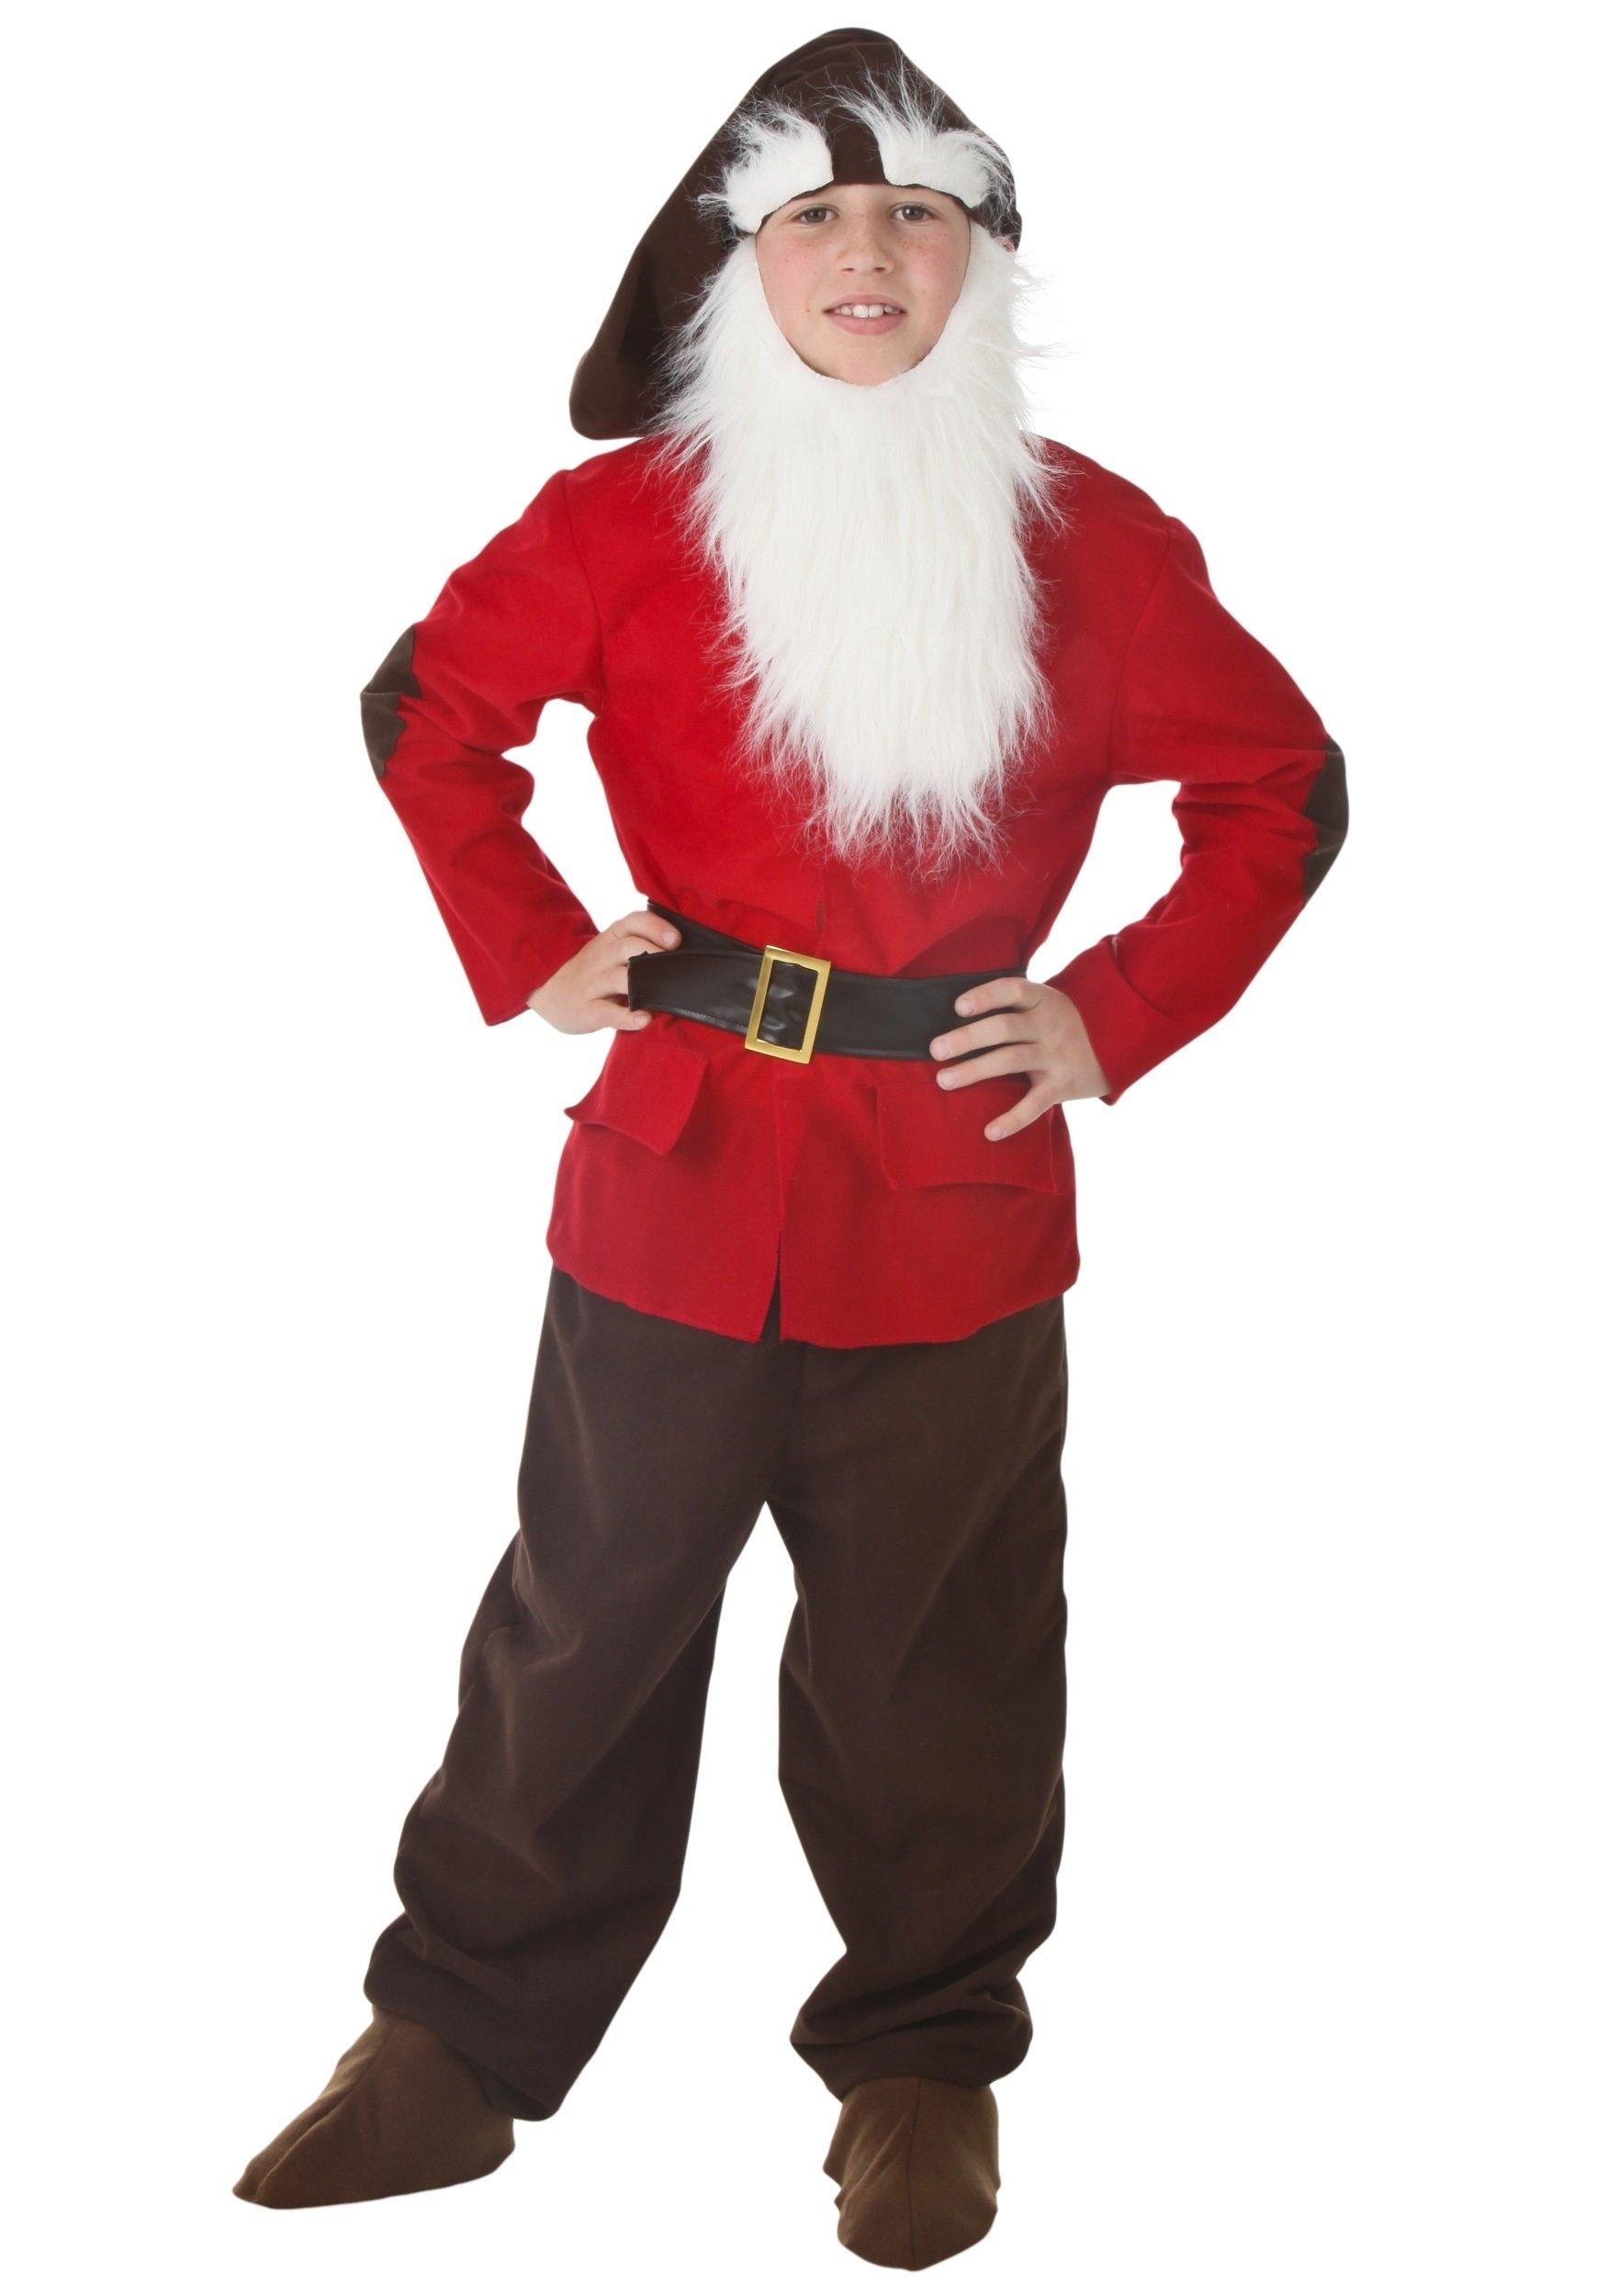 10 Ideal Halloween Costumes For Kids Ideas kids dwarf costume 2021